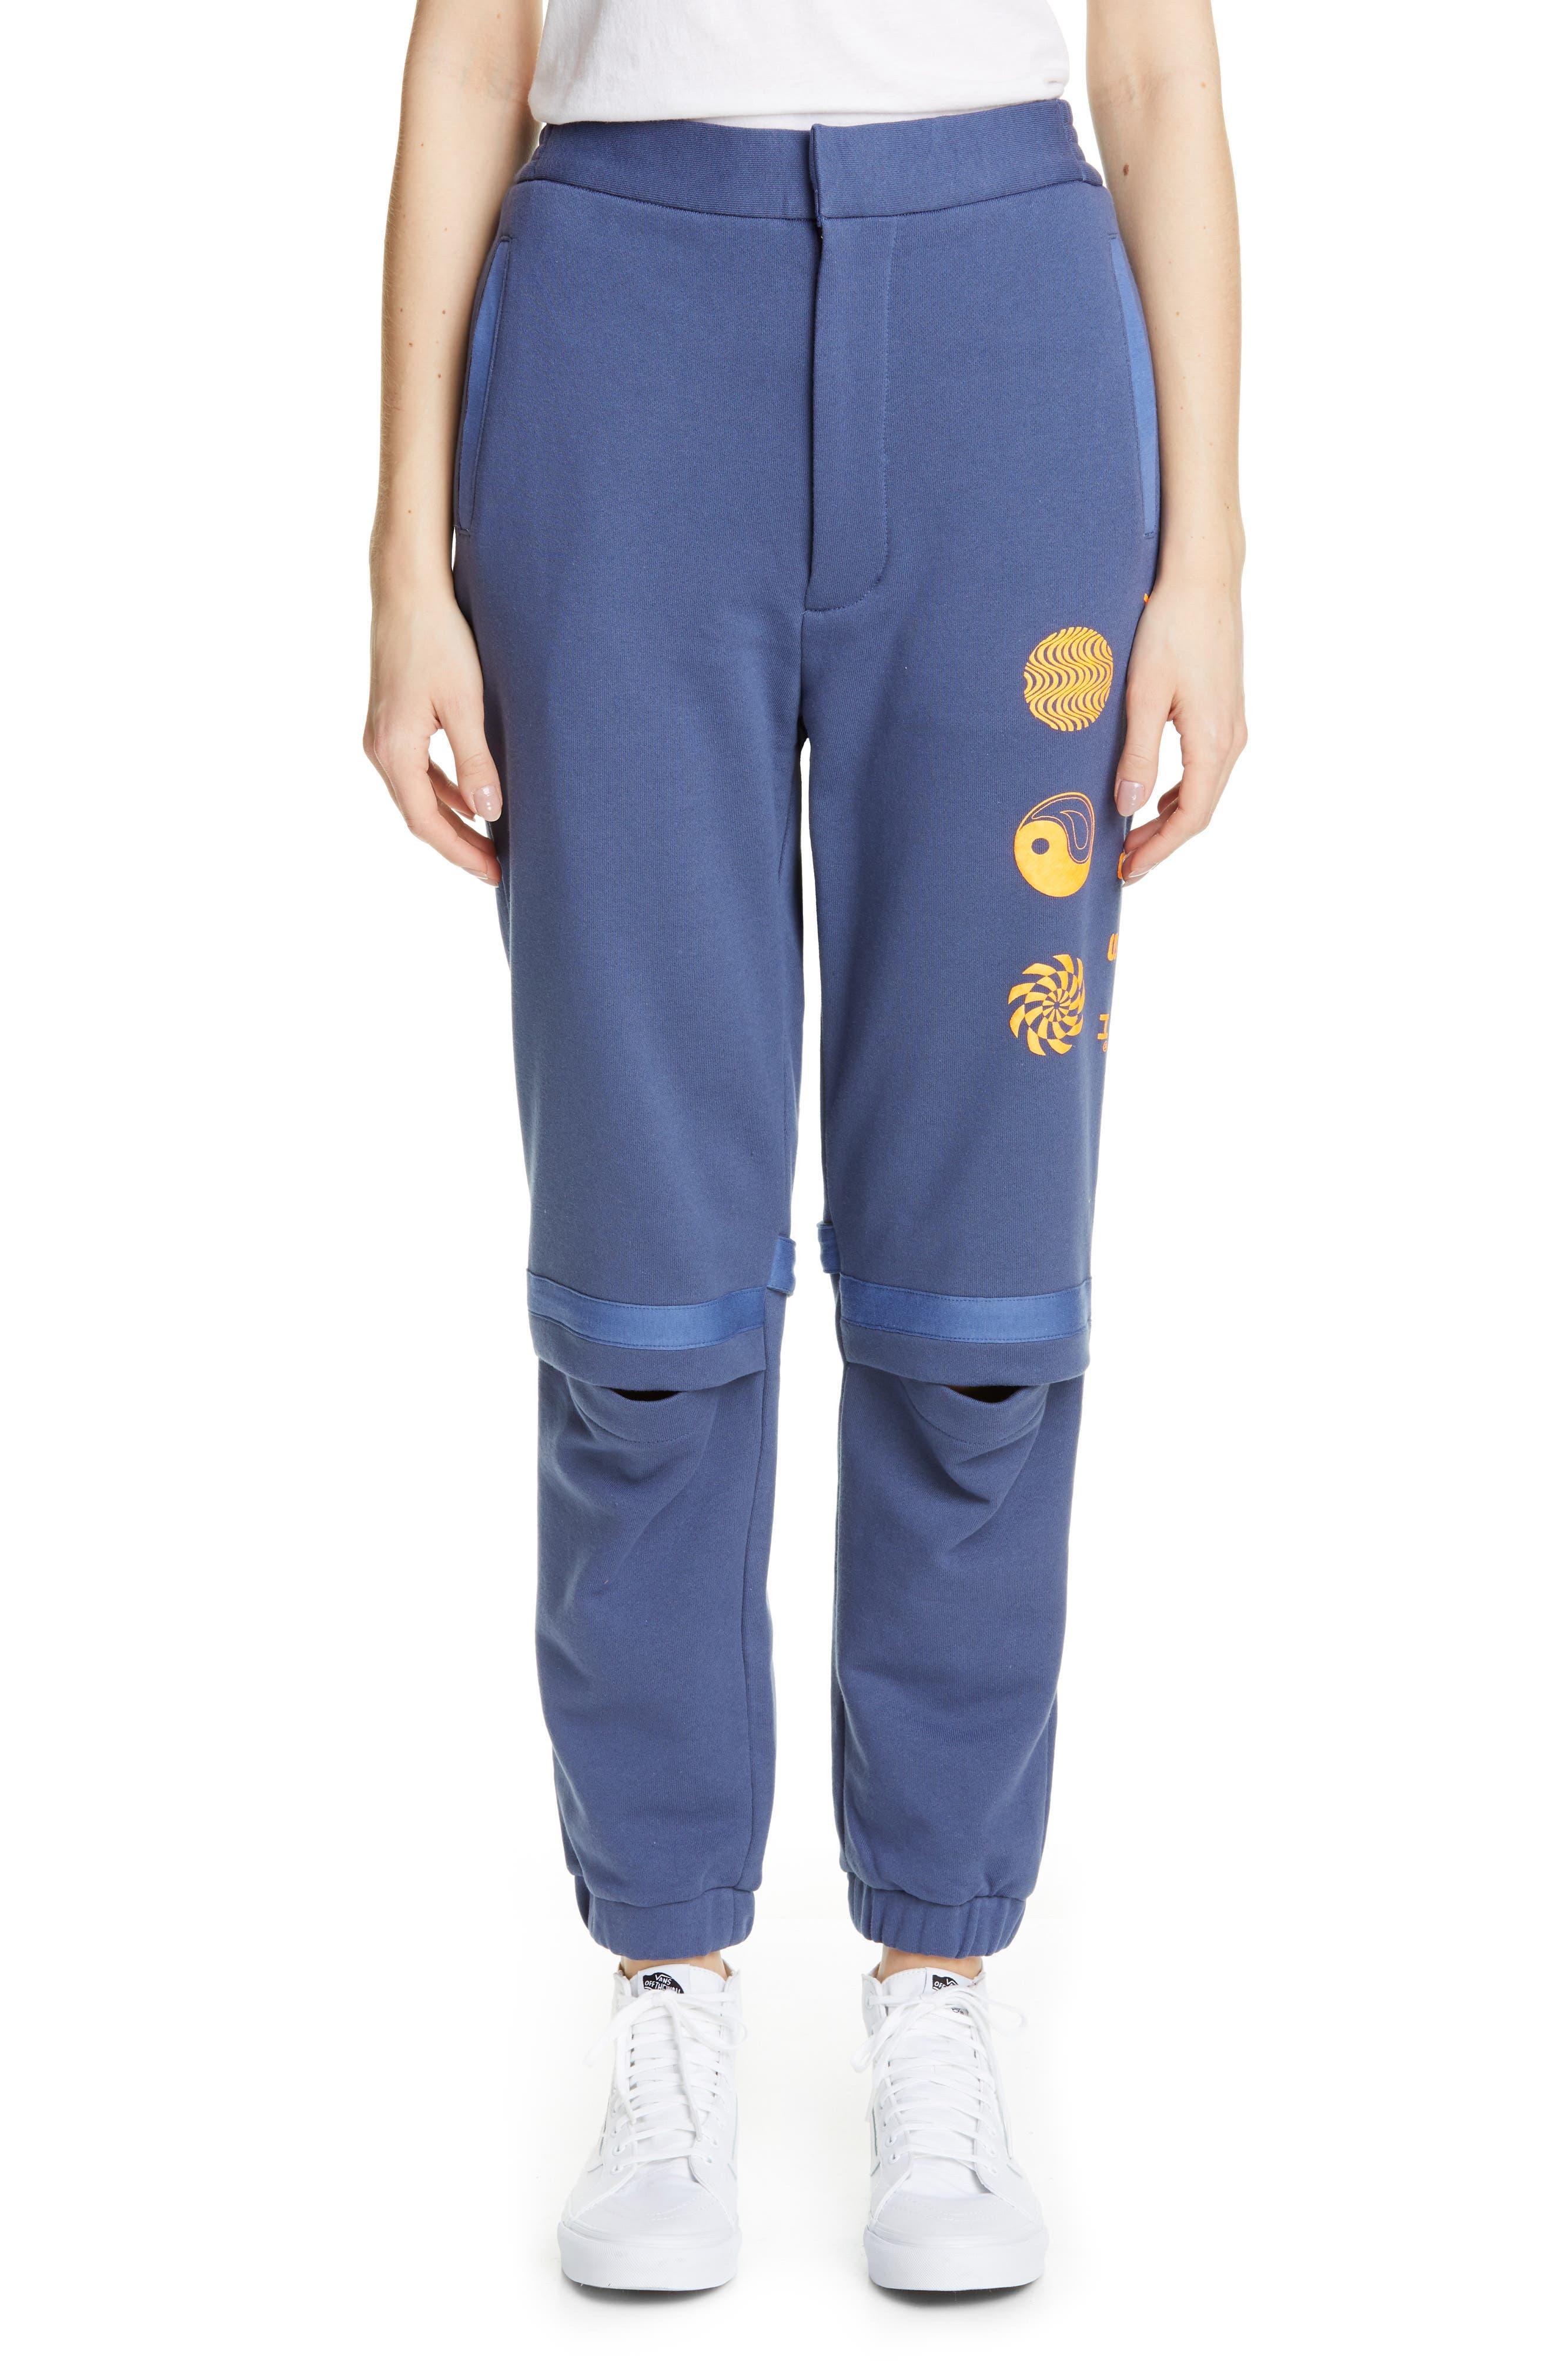 AMBUSH Slit Knee Sweatpants, Main, color, BLUE